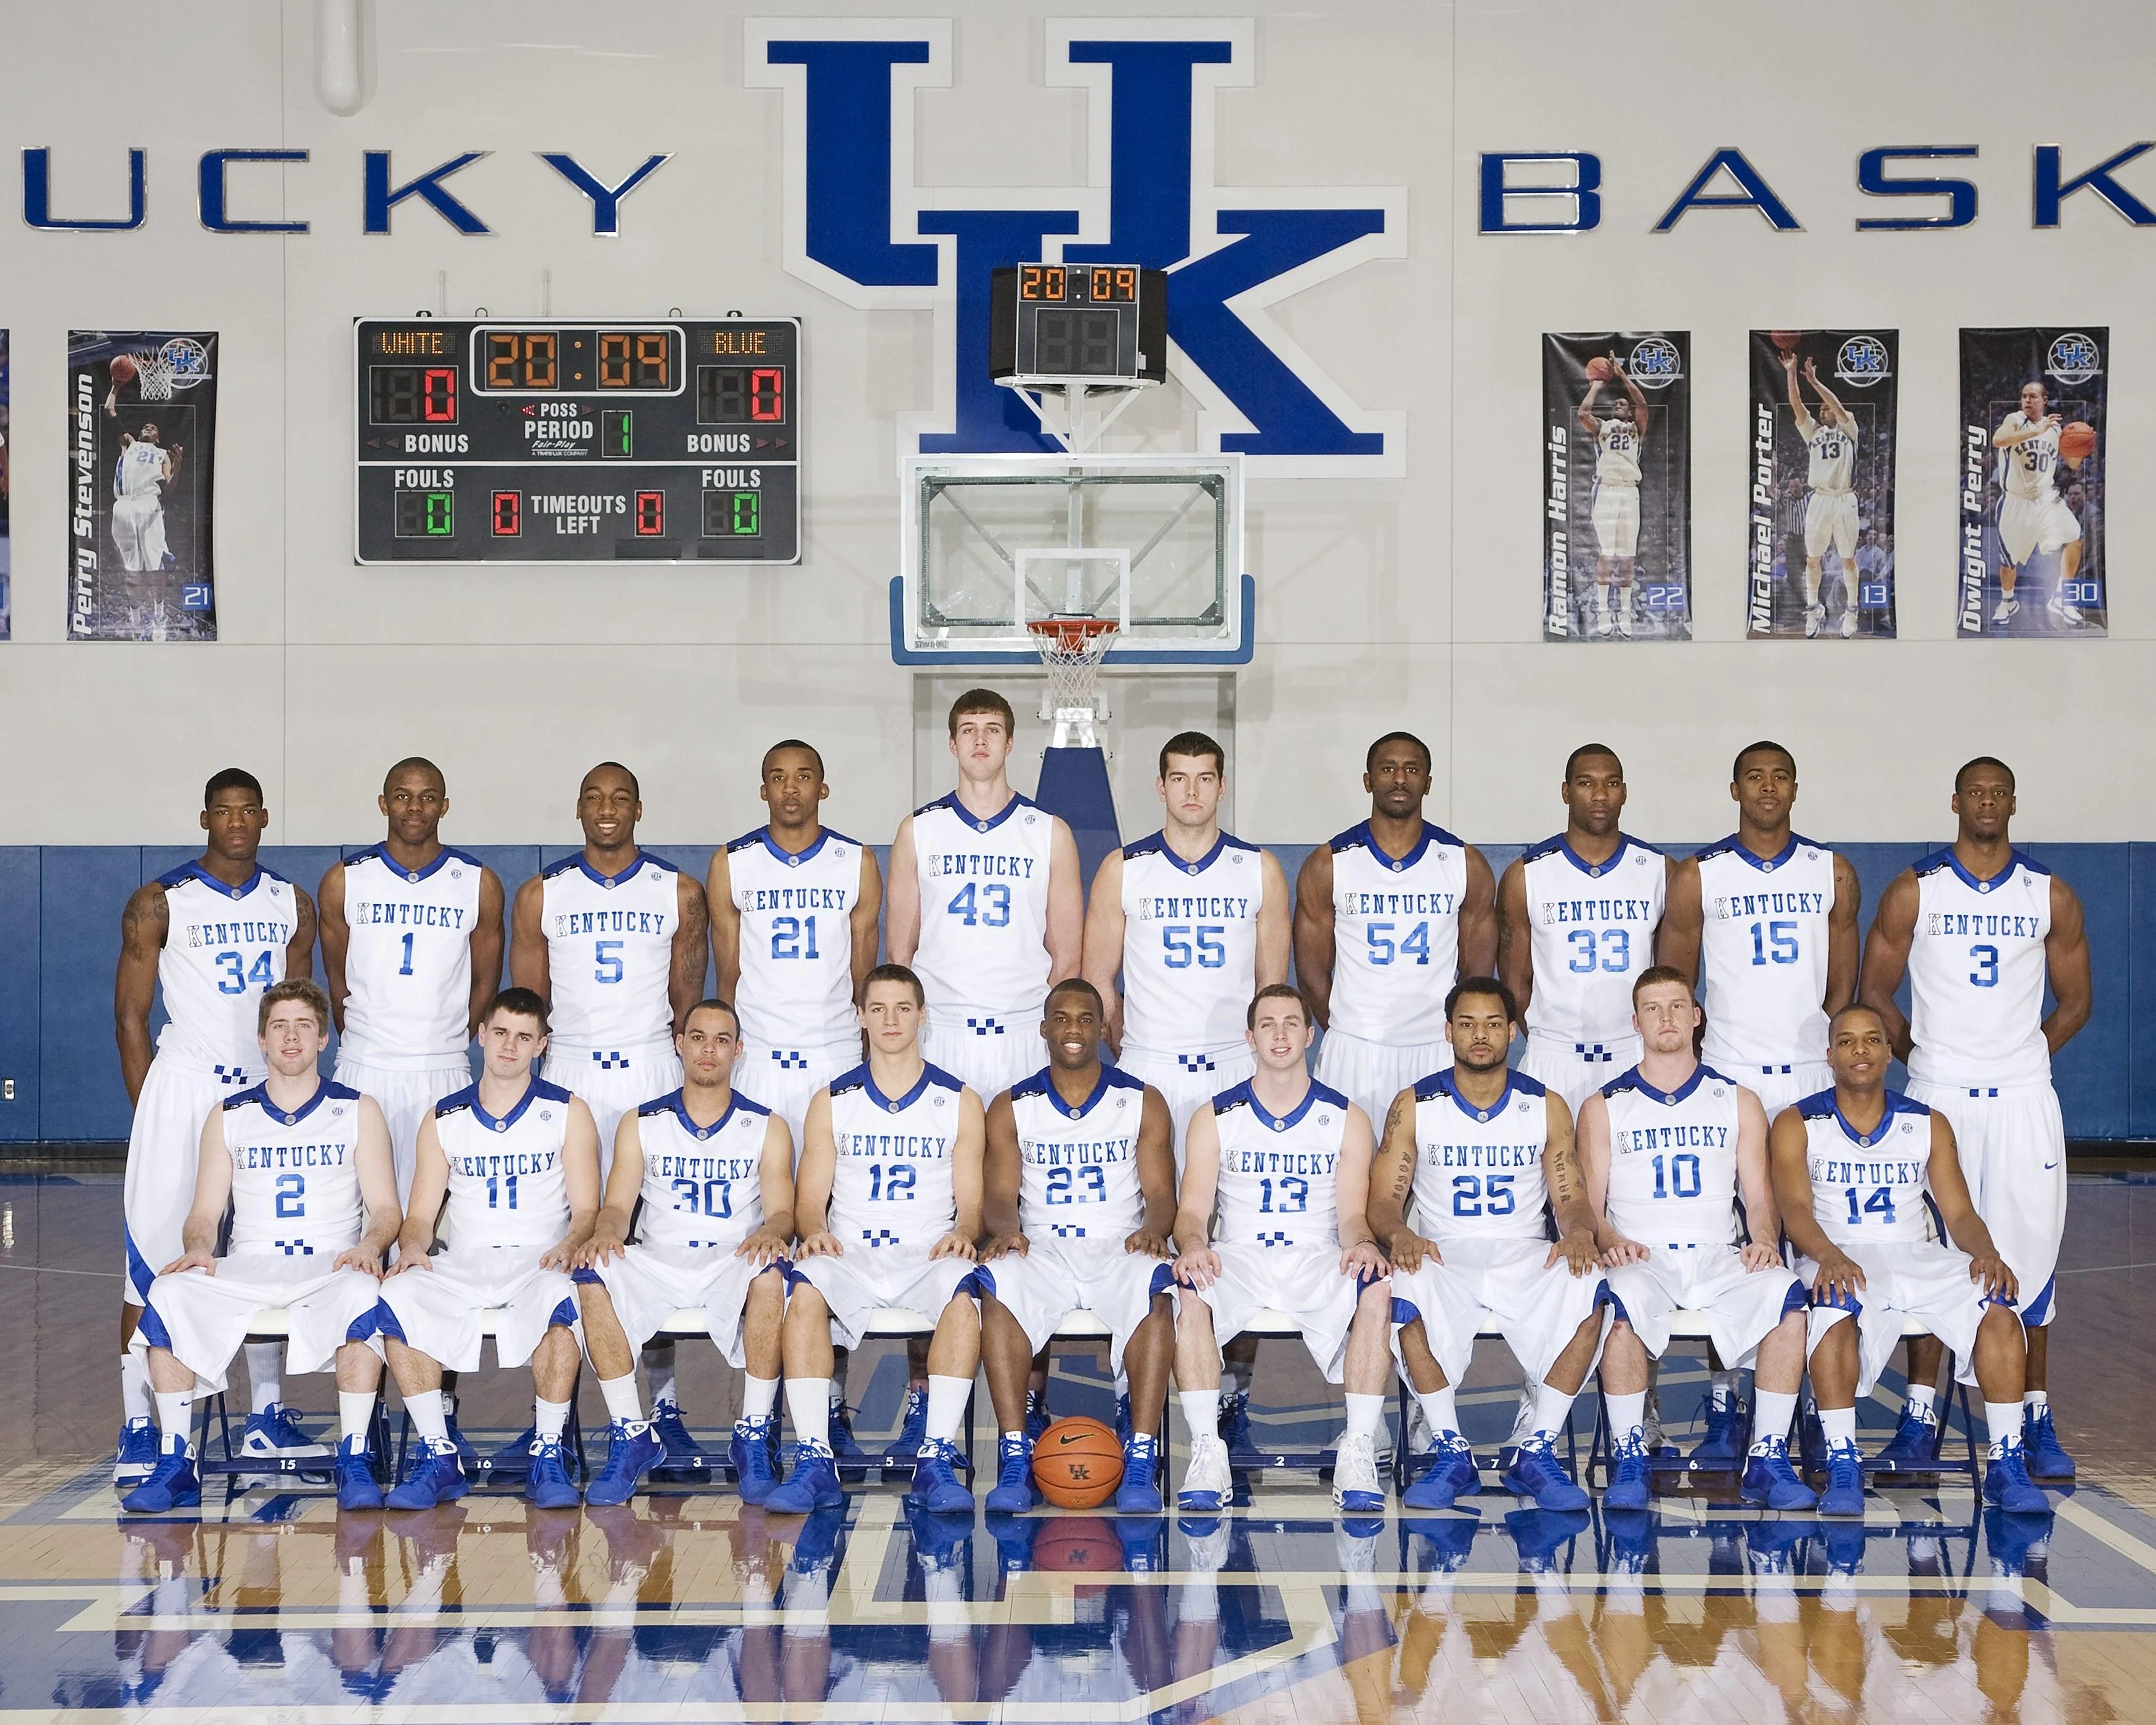 Uk Basketball: 2008-2009 Kentucky Basketball Roster